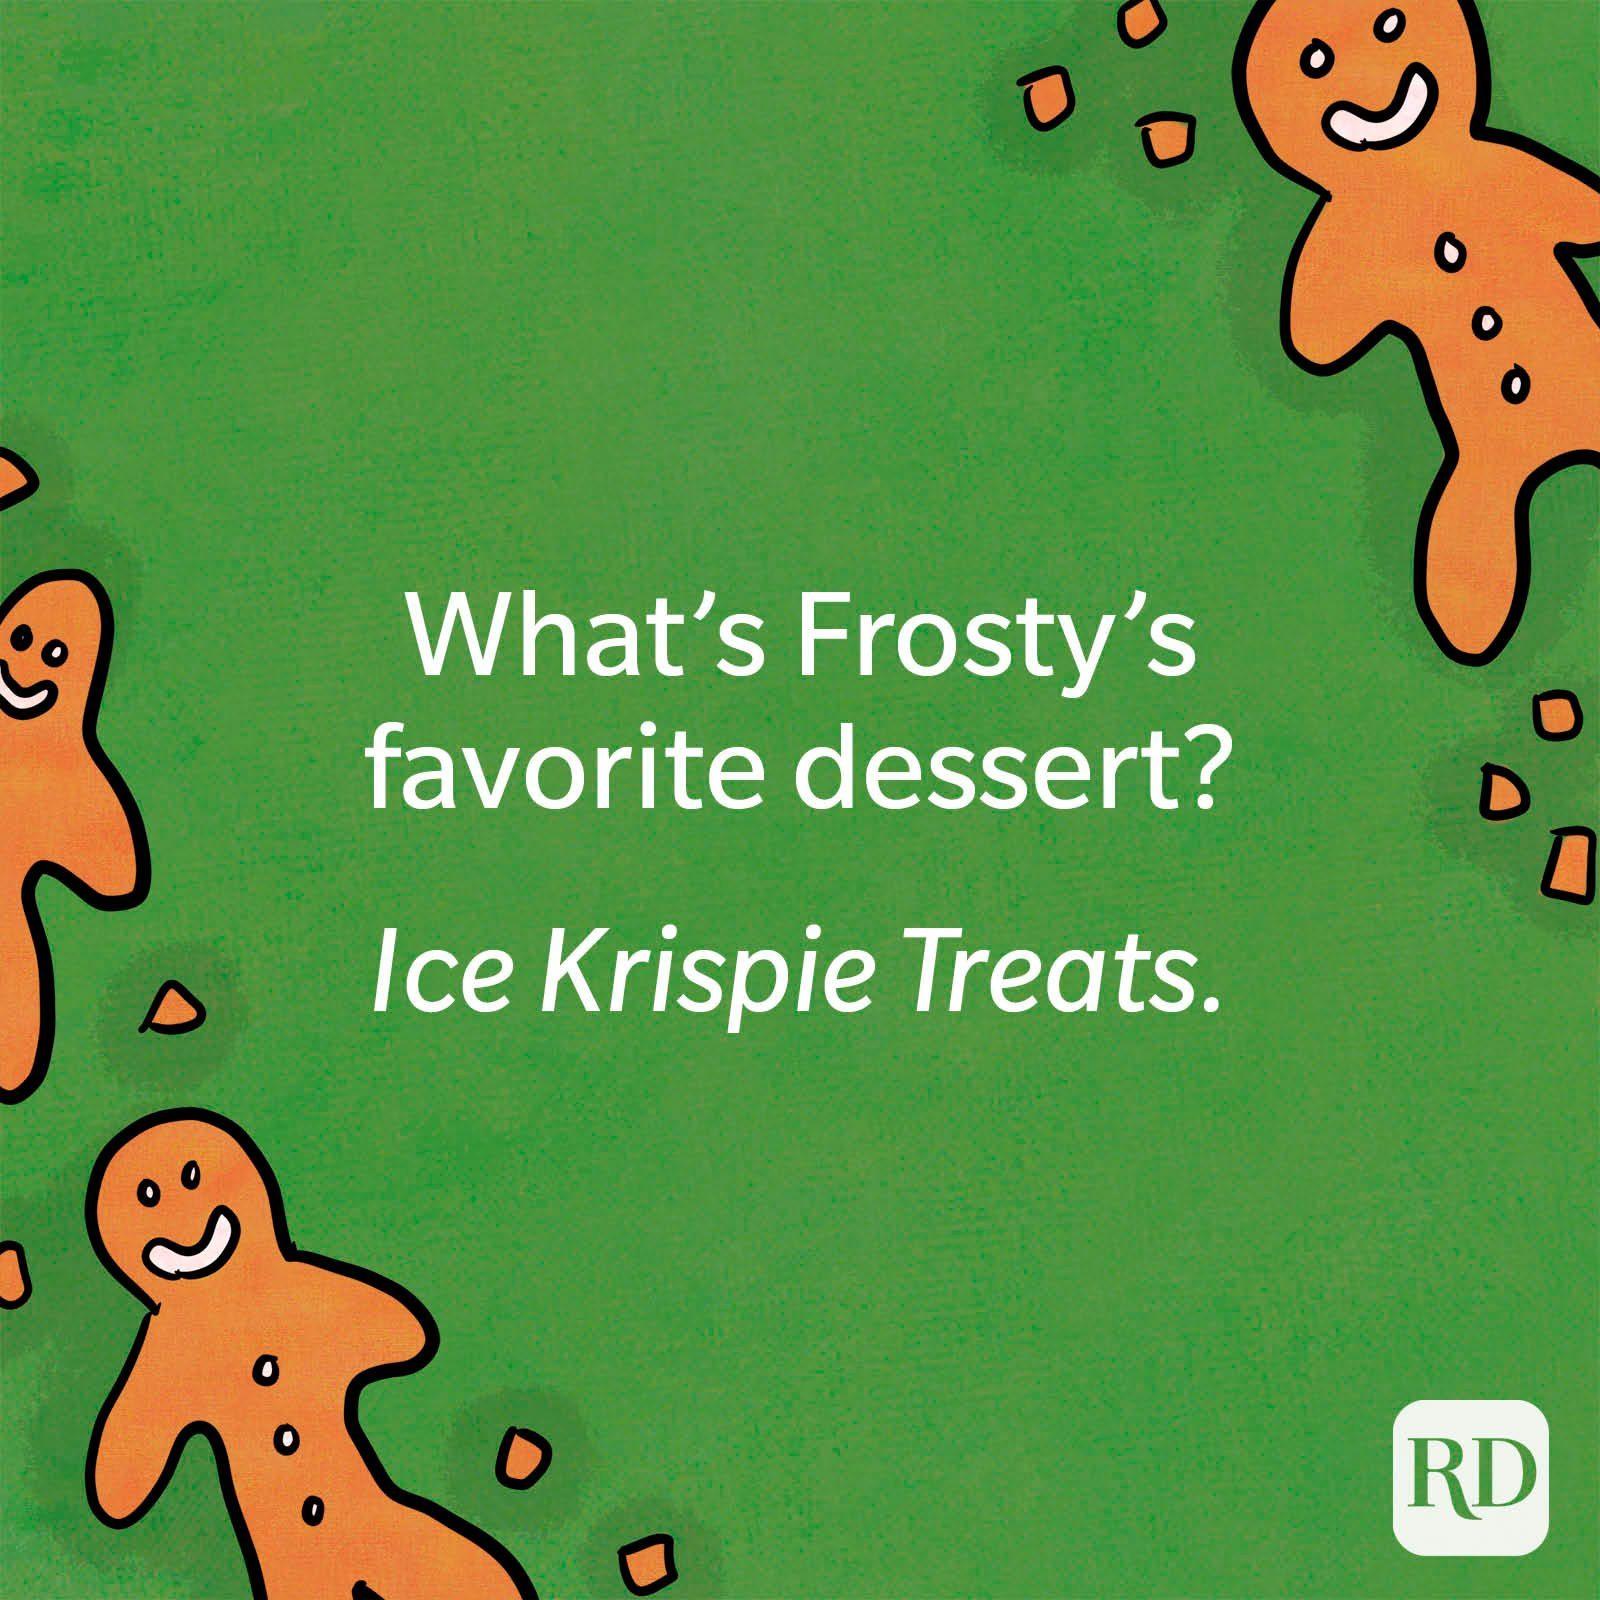 What's Frosty's favorite dessert?